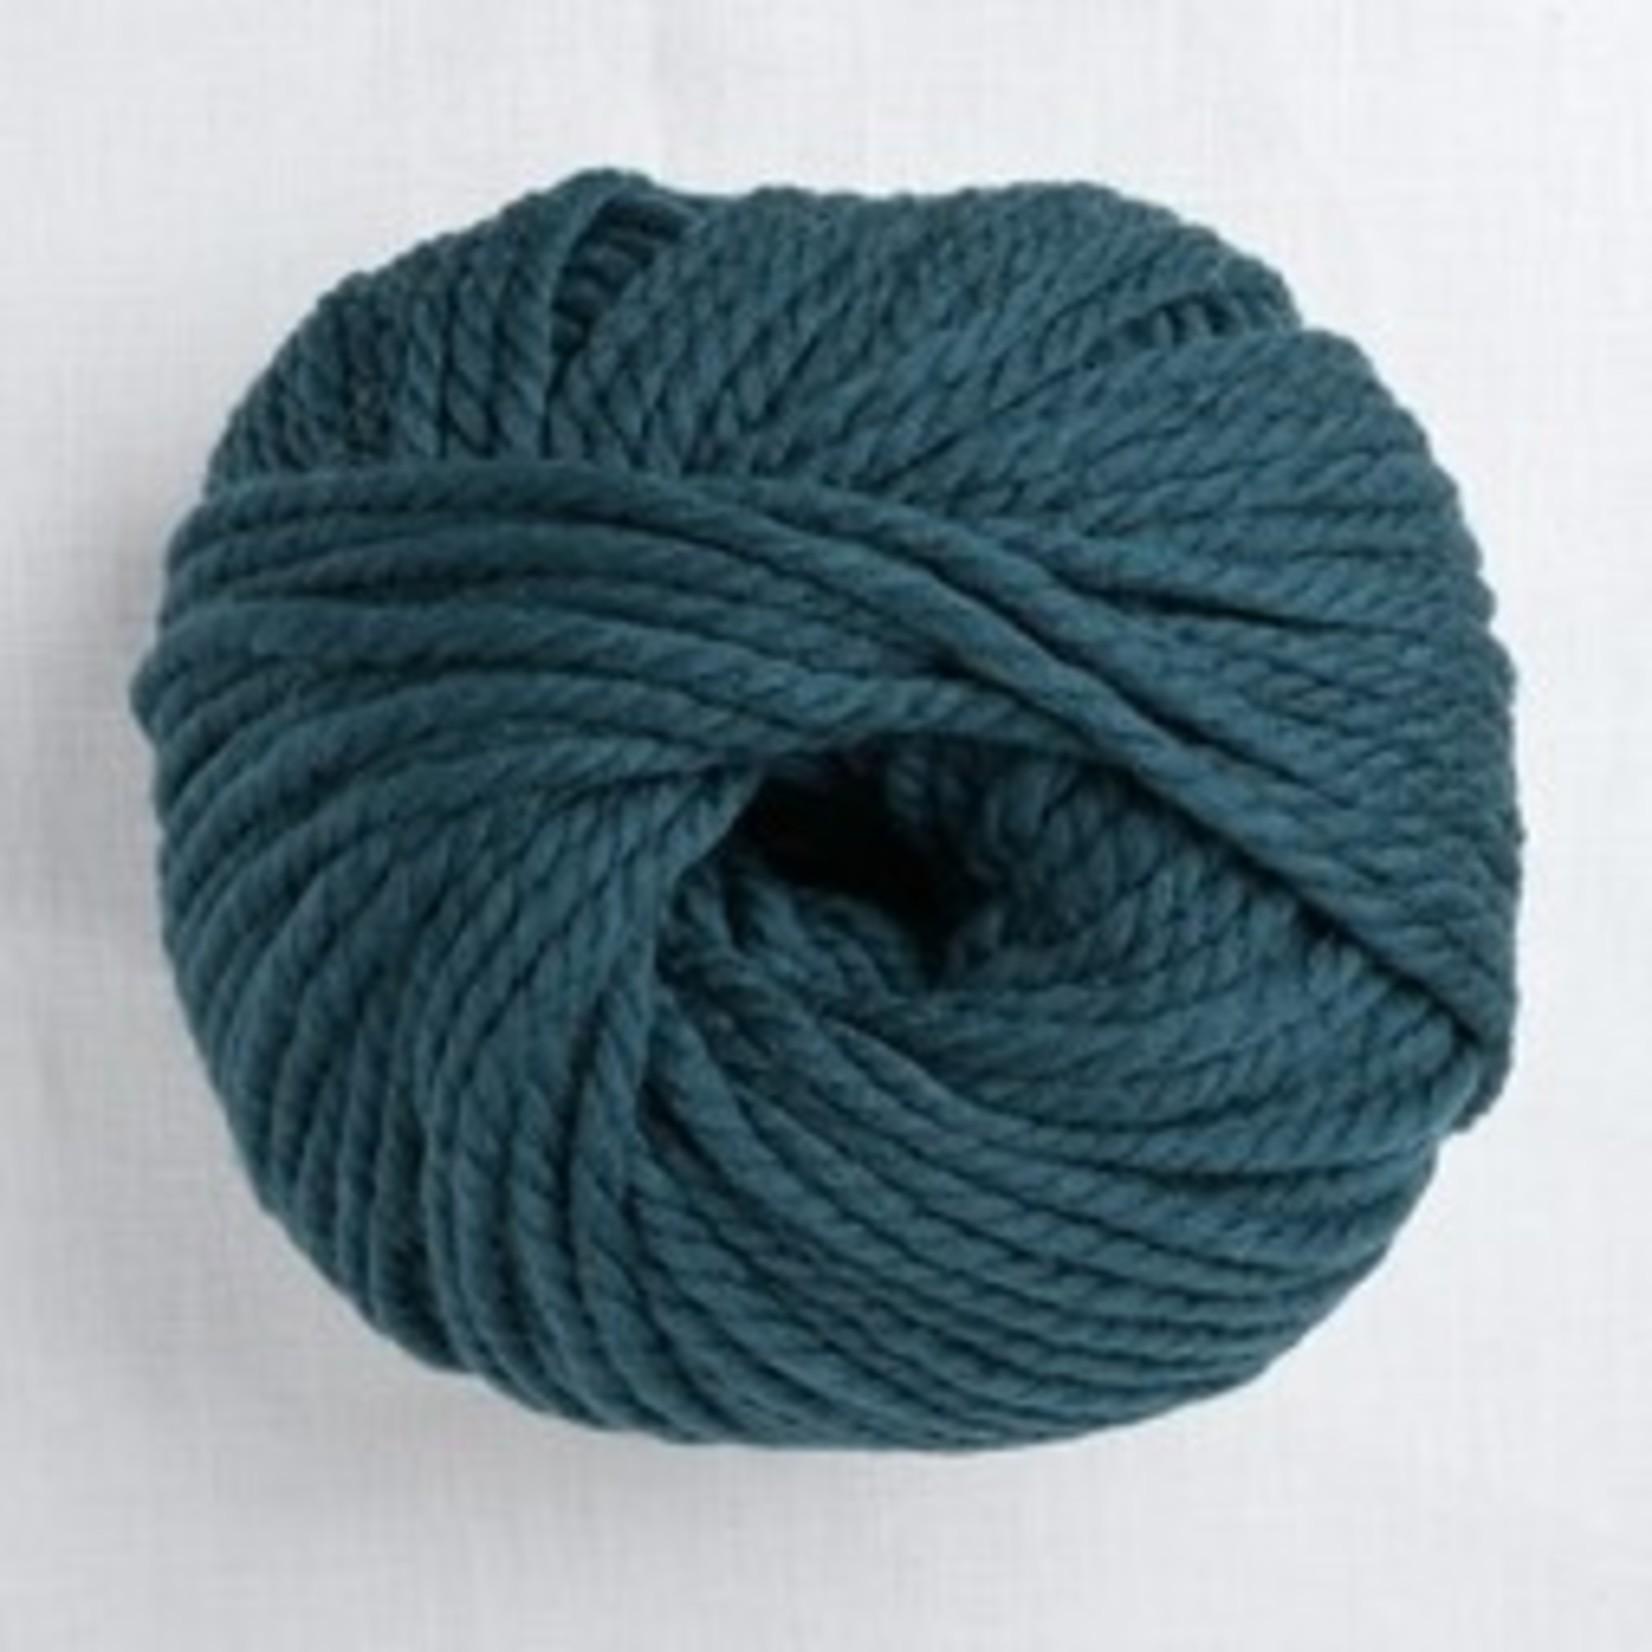 Sirdar Spinning Big Wool, 087, Mallard